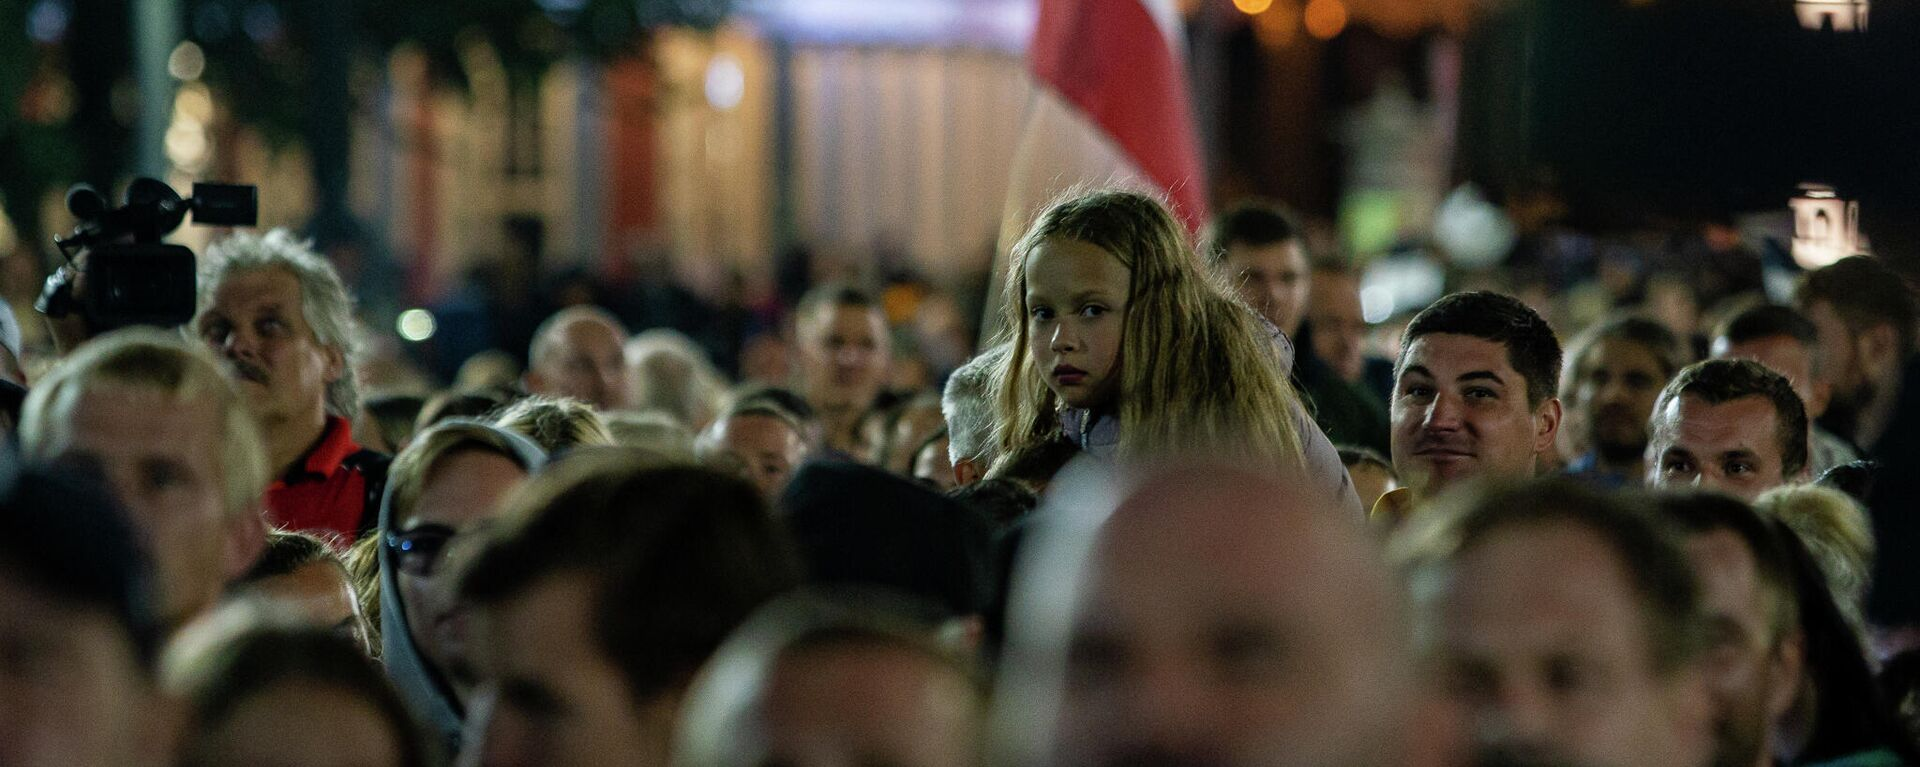 Акция протеста против обязательной вакцинации в Риге, 18 августа - Sputnik Латвия, 1920, 15.09.2021